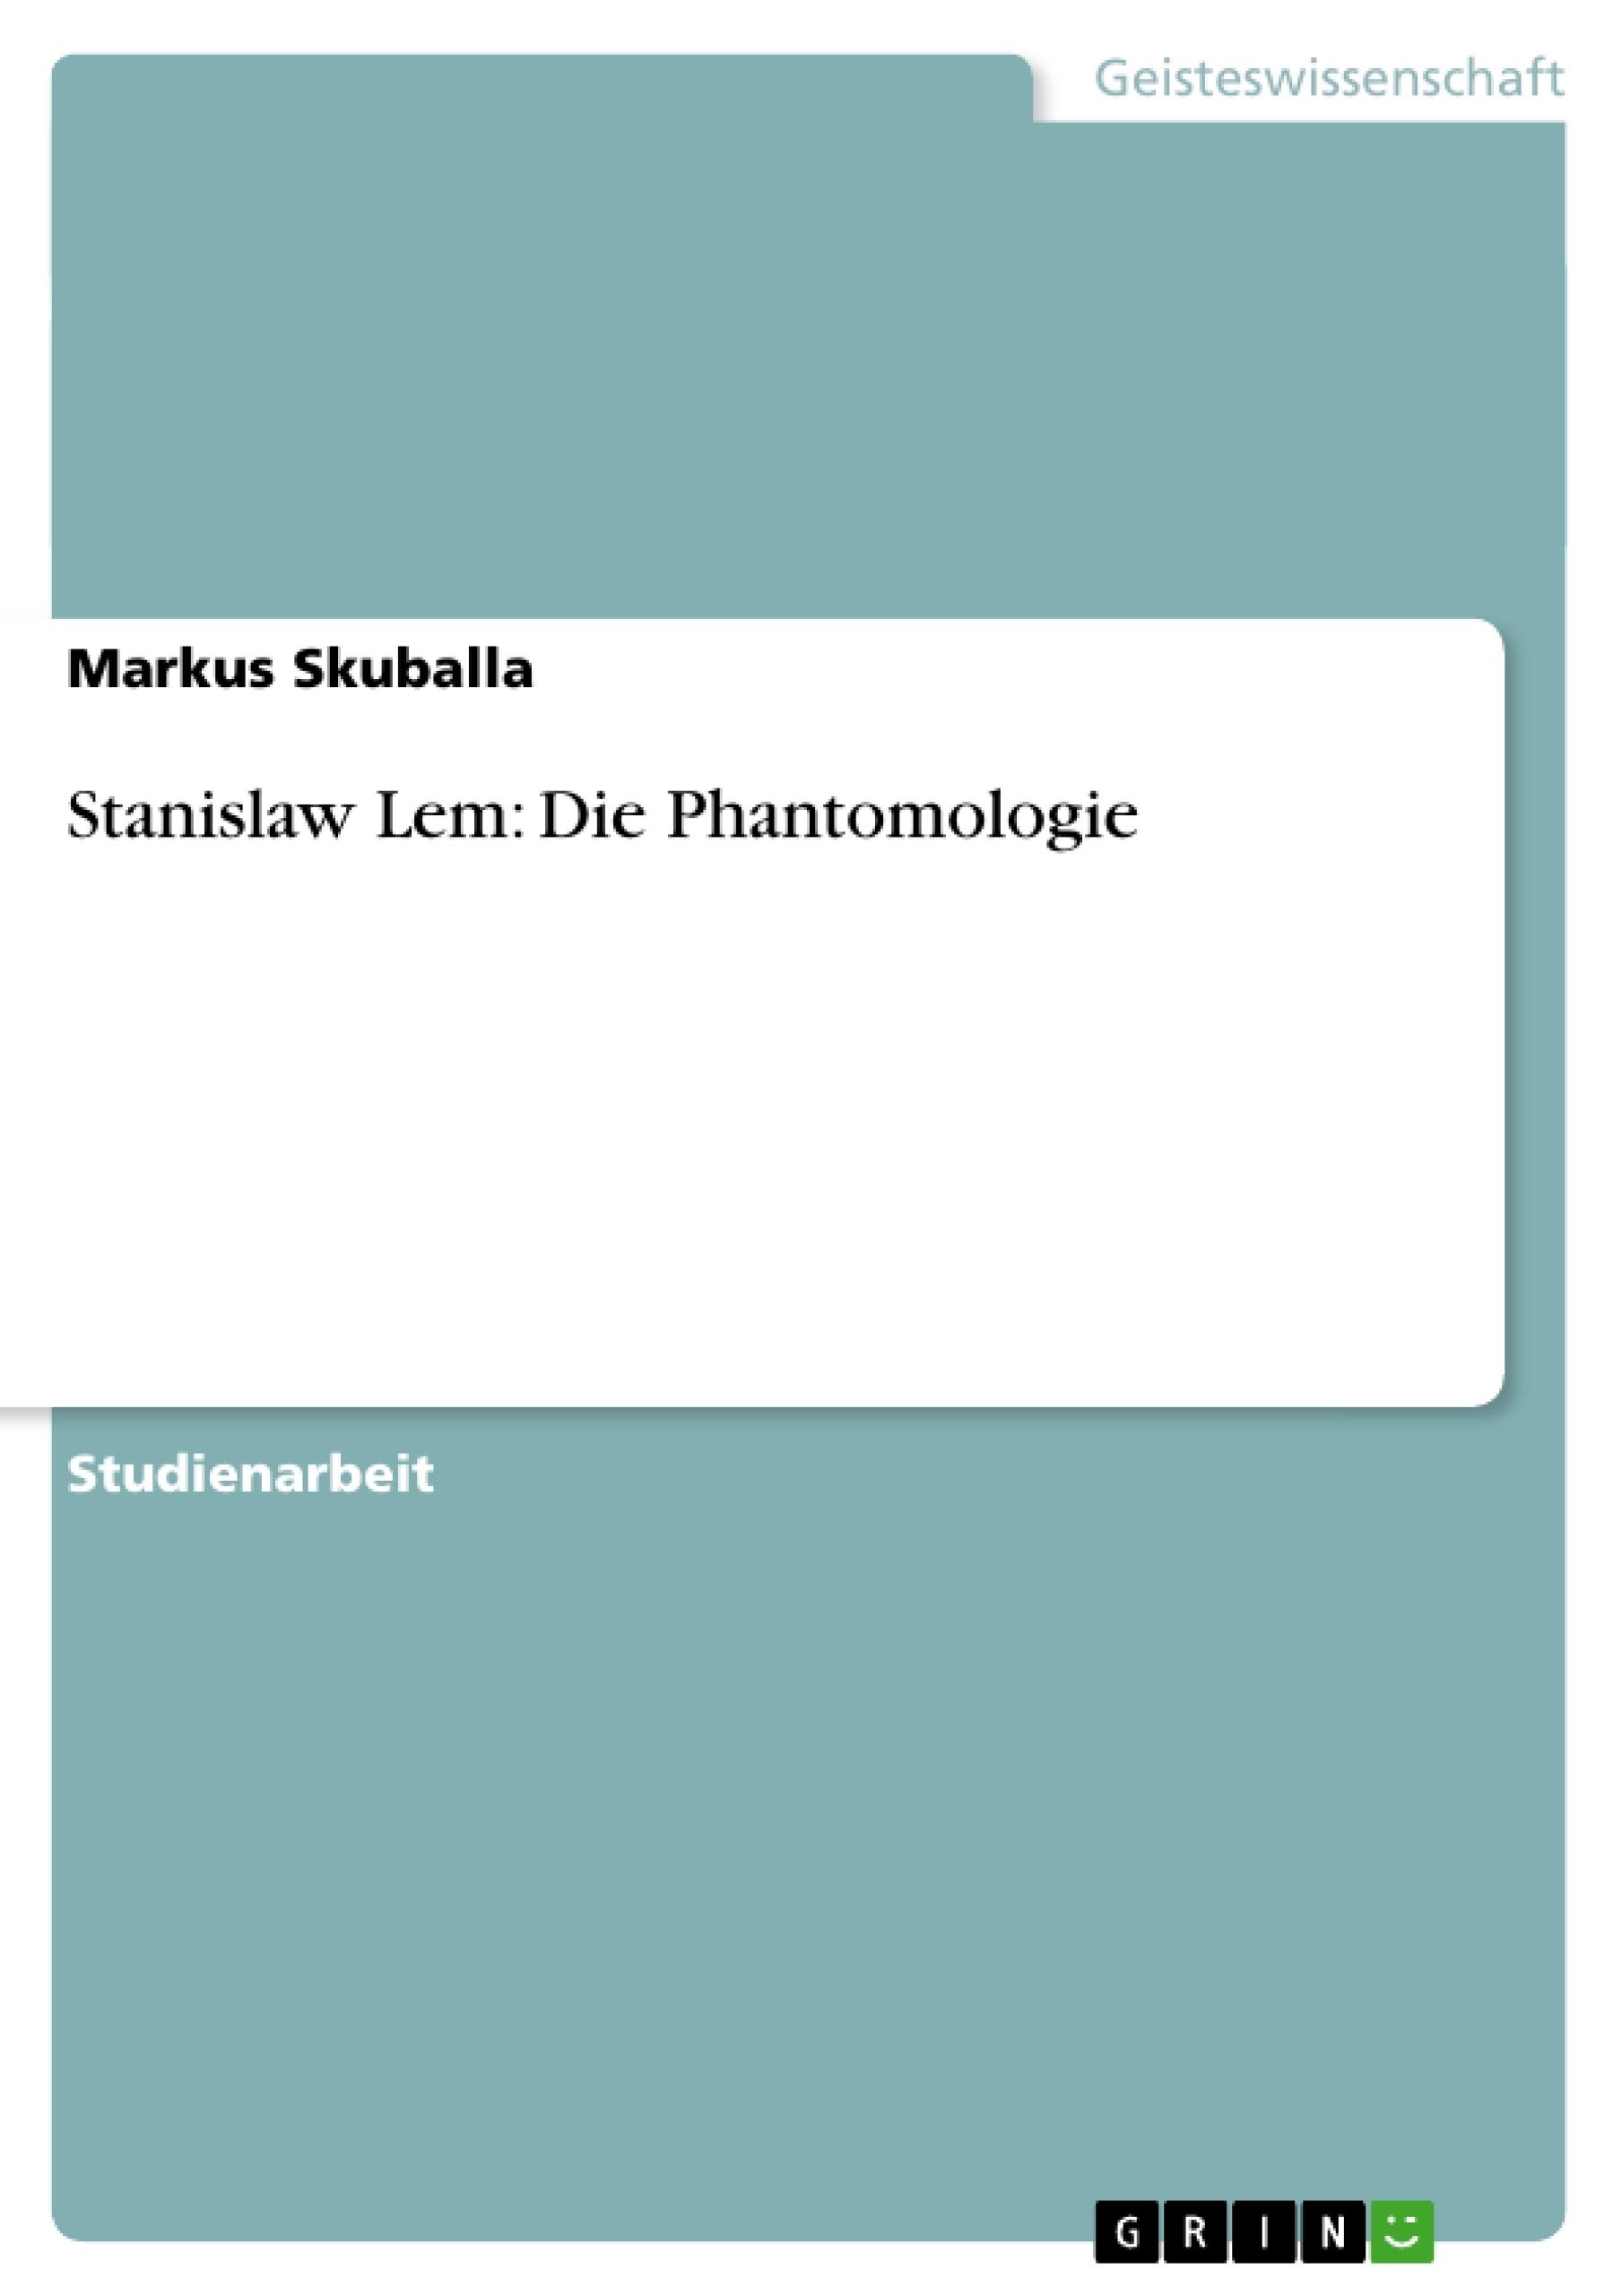 Titel: Stanislaw Lem: Die Phantomologie